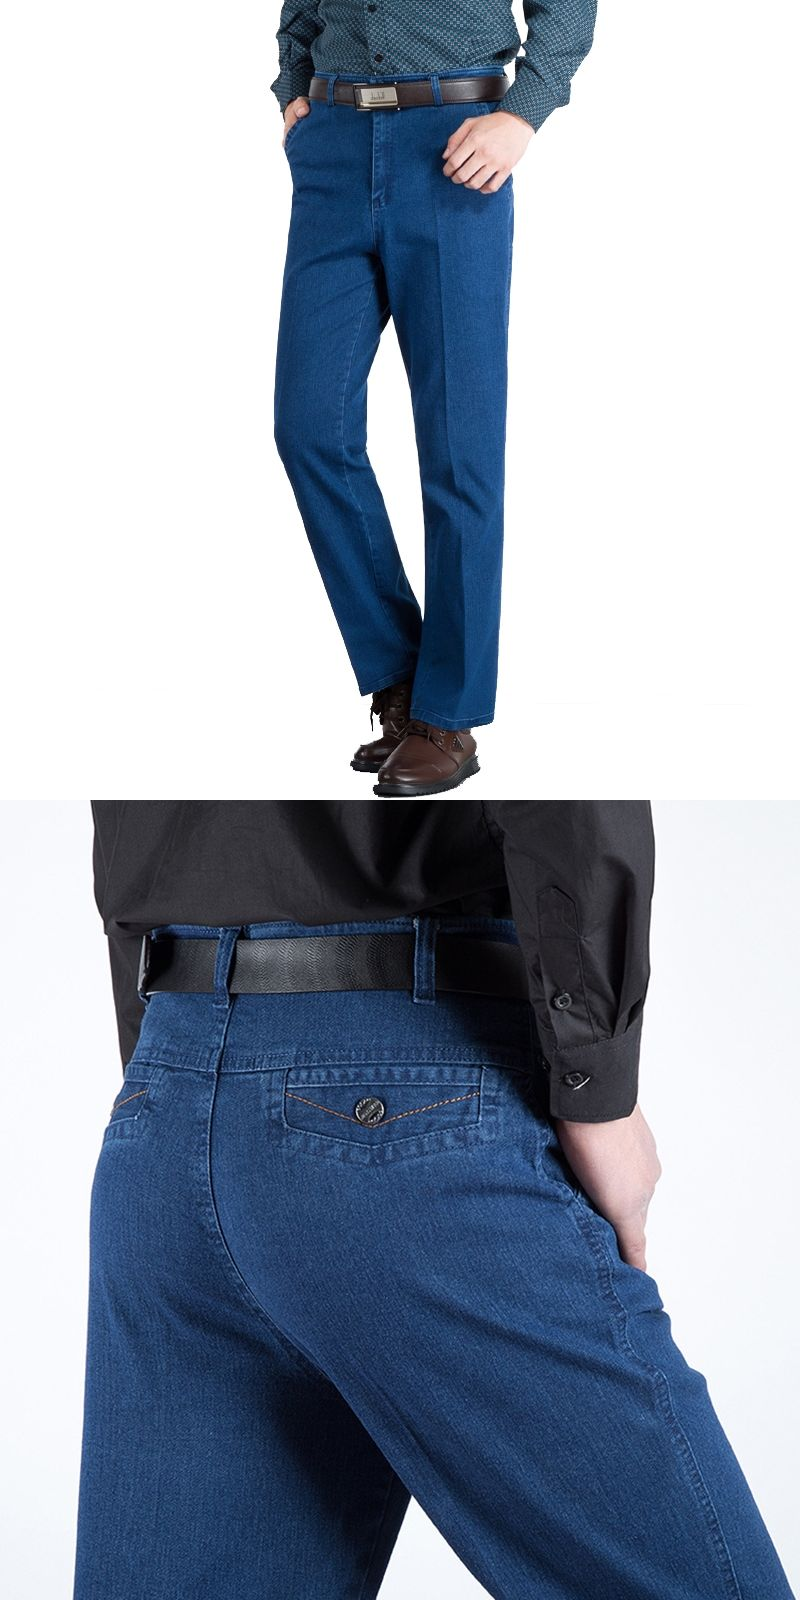 c6f39616d7e Loose Elastic Mens Jeans High Waist Straight Trouser Man Working Pants  Famous Brand Blue Male Jeans Designer Classic Denim Jeans